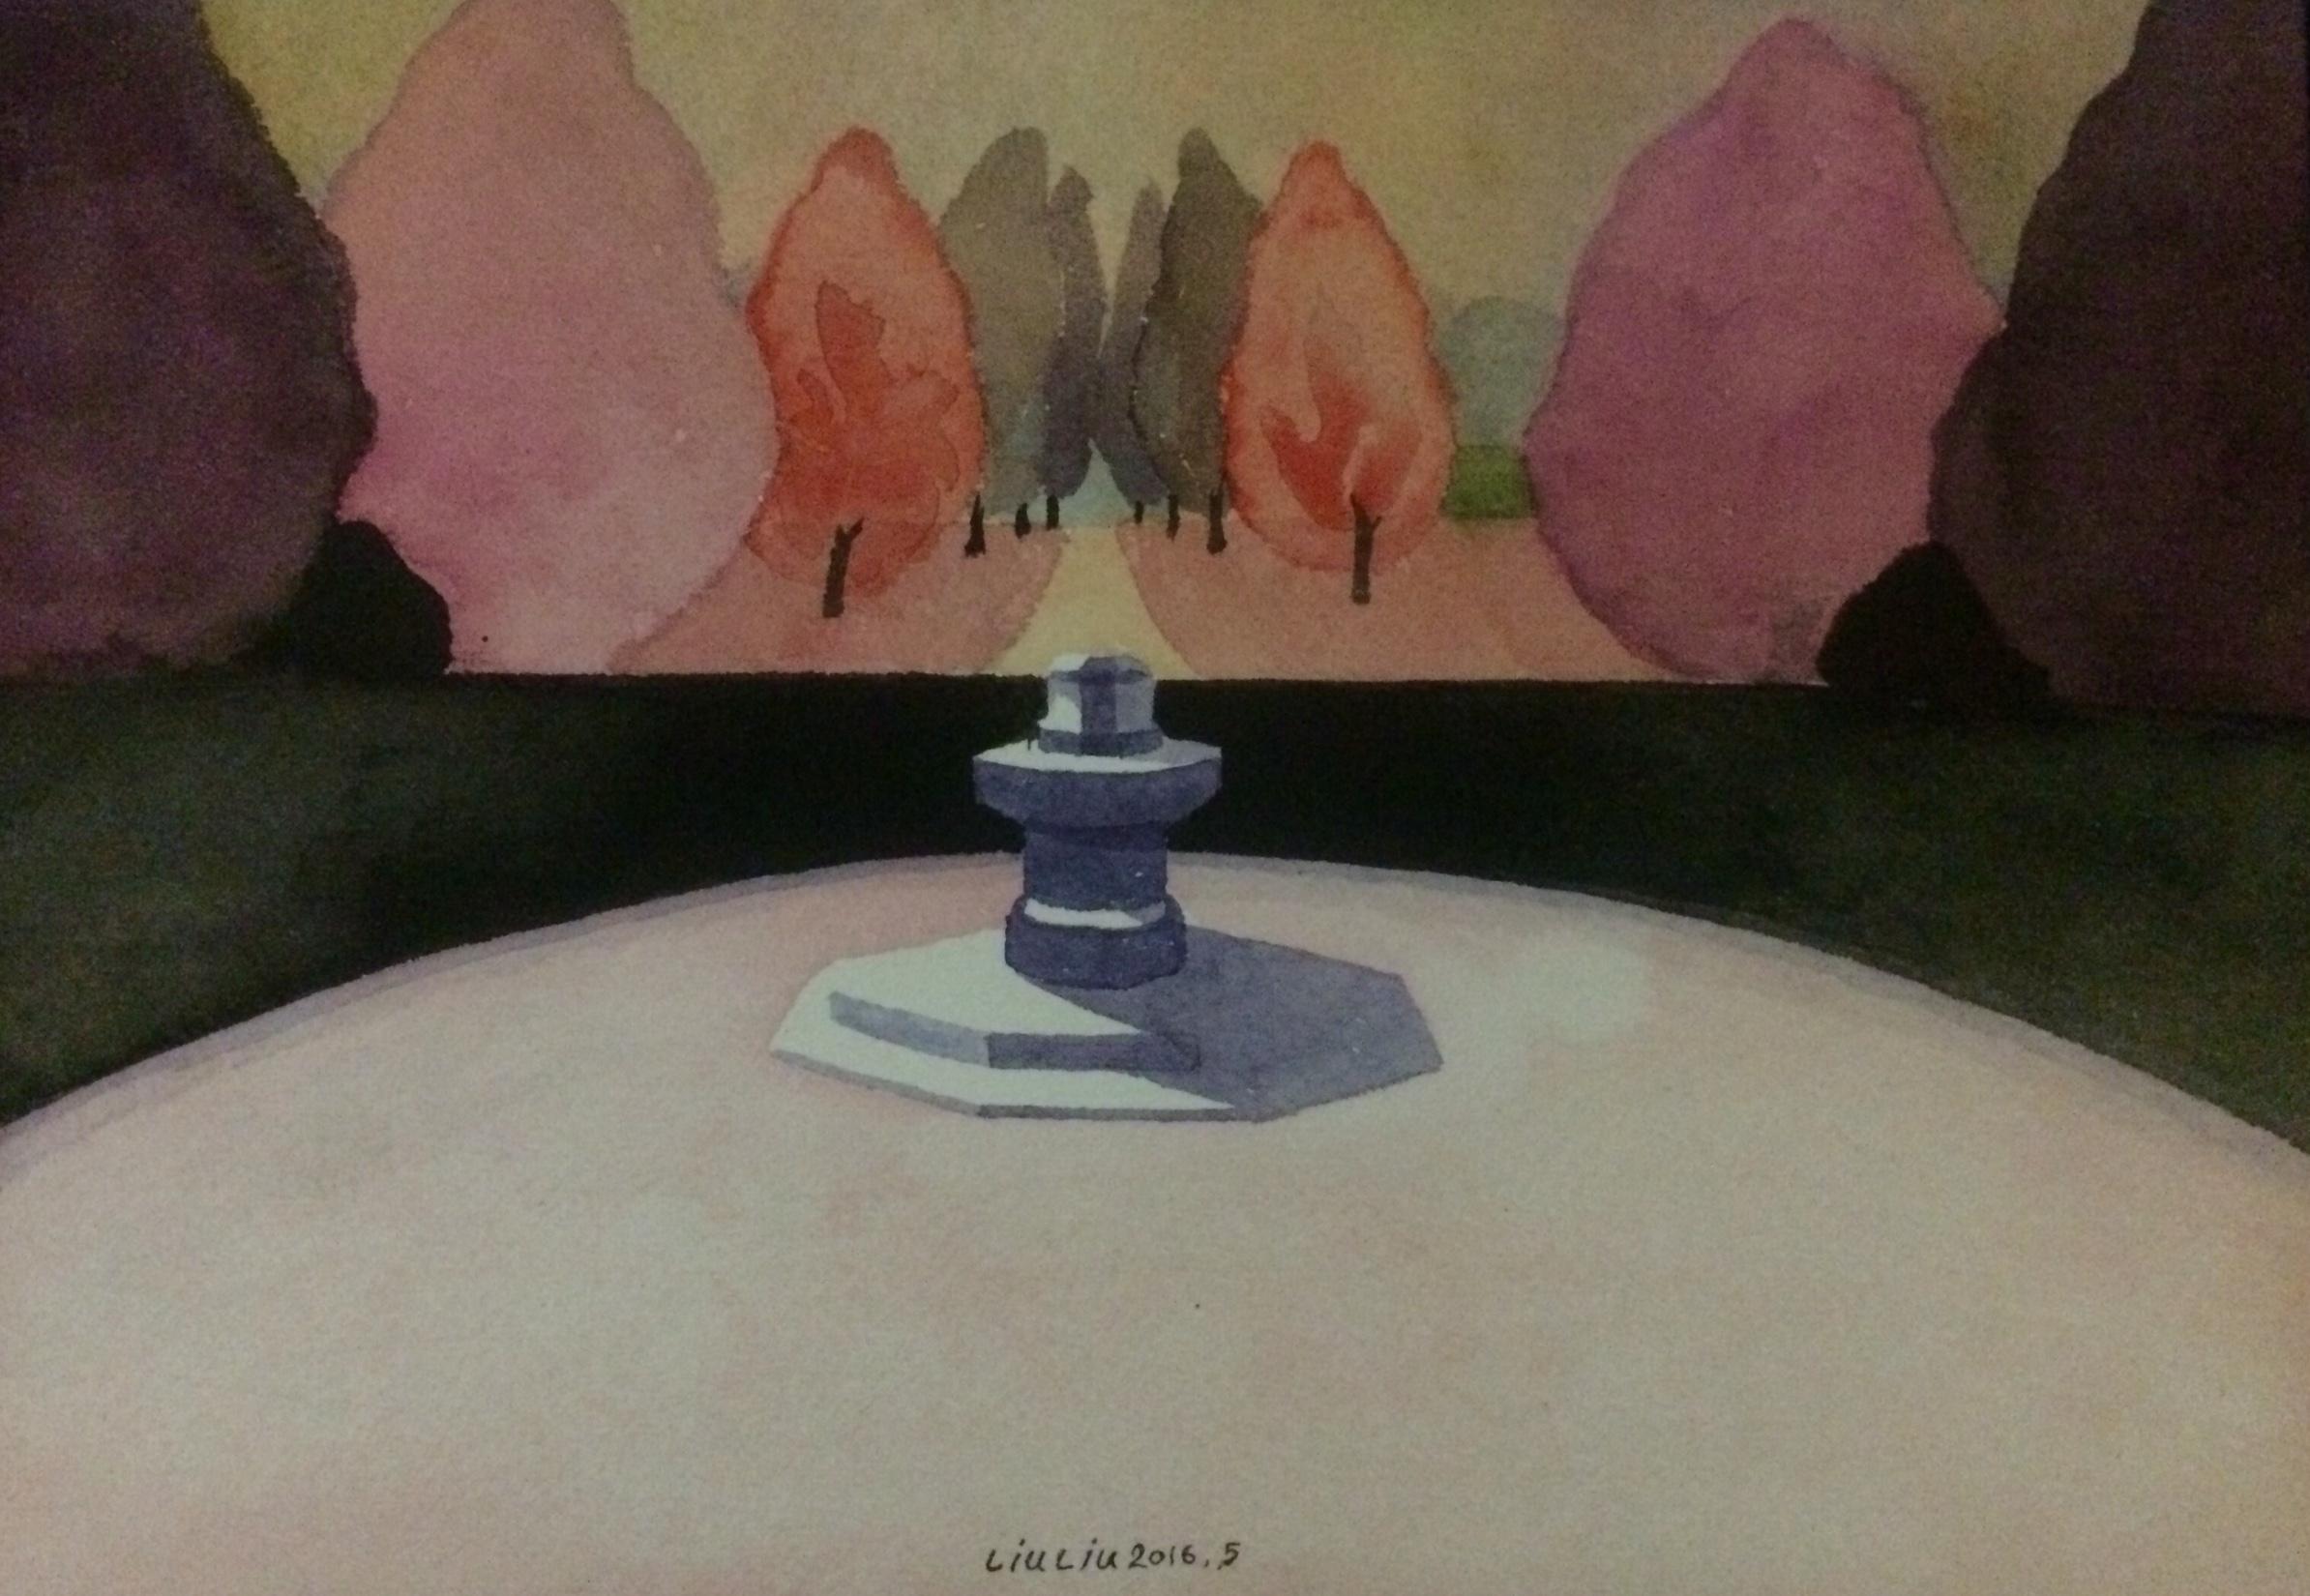 Liu Liu 刘流, Haze 氤氲, 2015, Watercolor on paper 纸上水彩, 18 x 26 cm